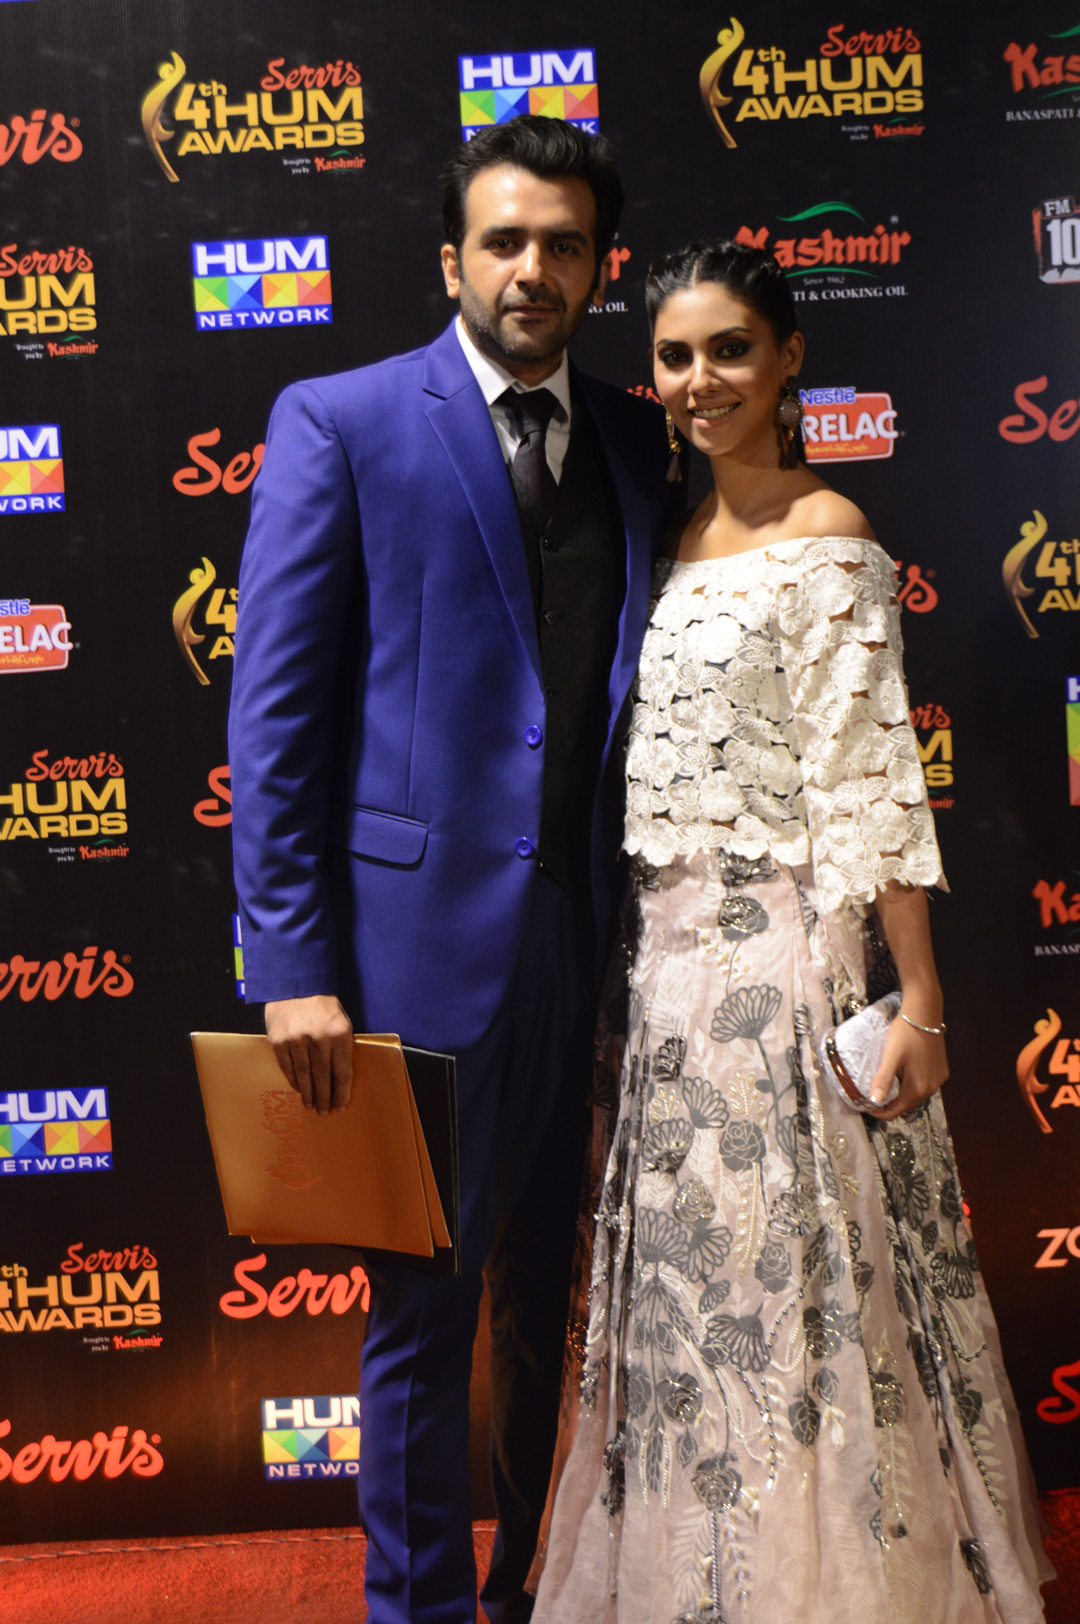 Sunita Marshal and Hassan Ahmed HUM Awards Red Carpet